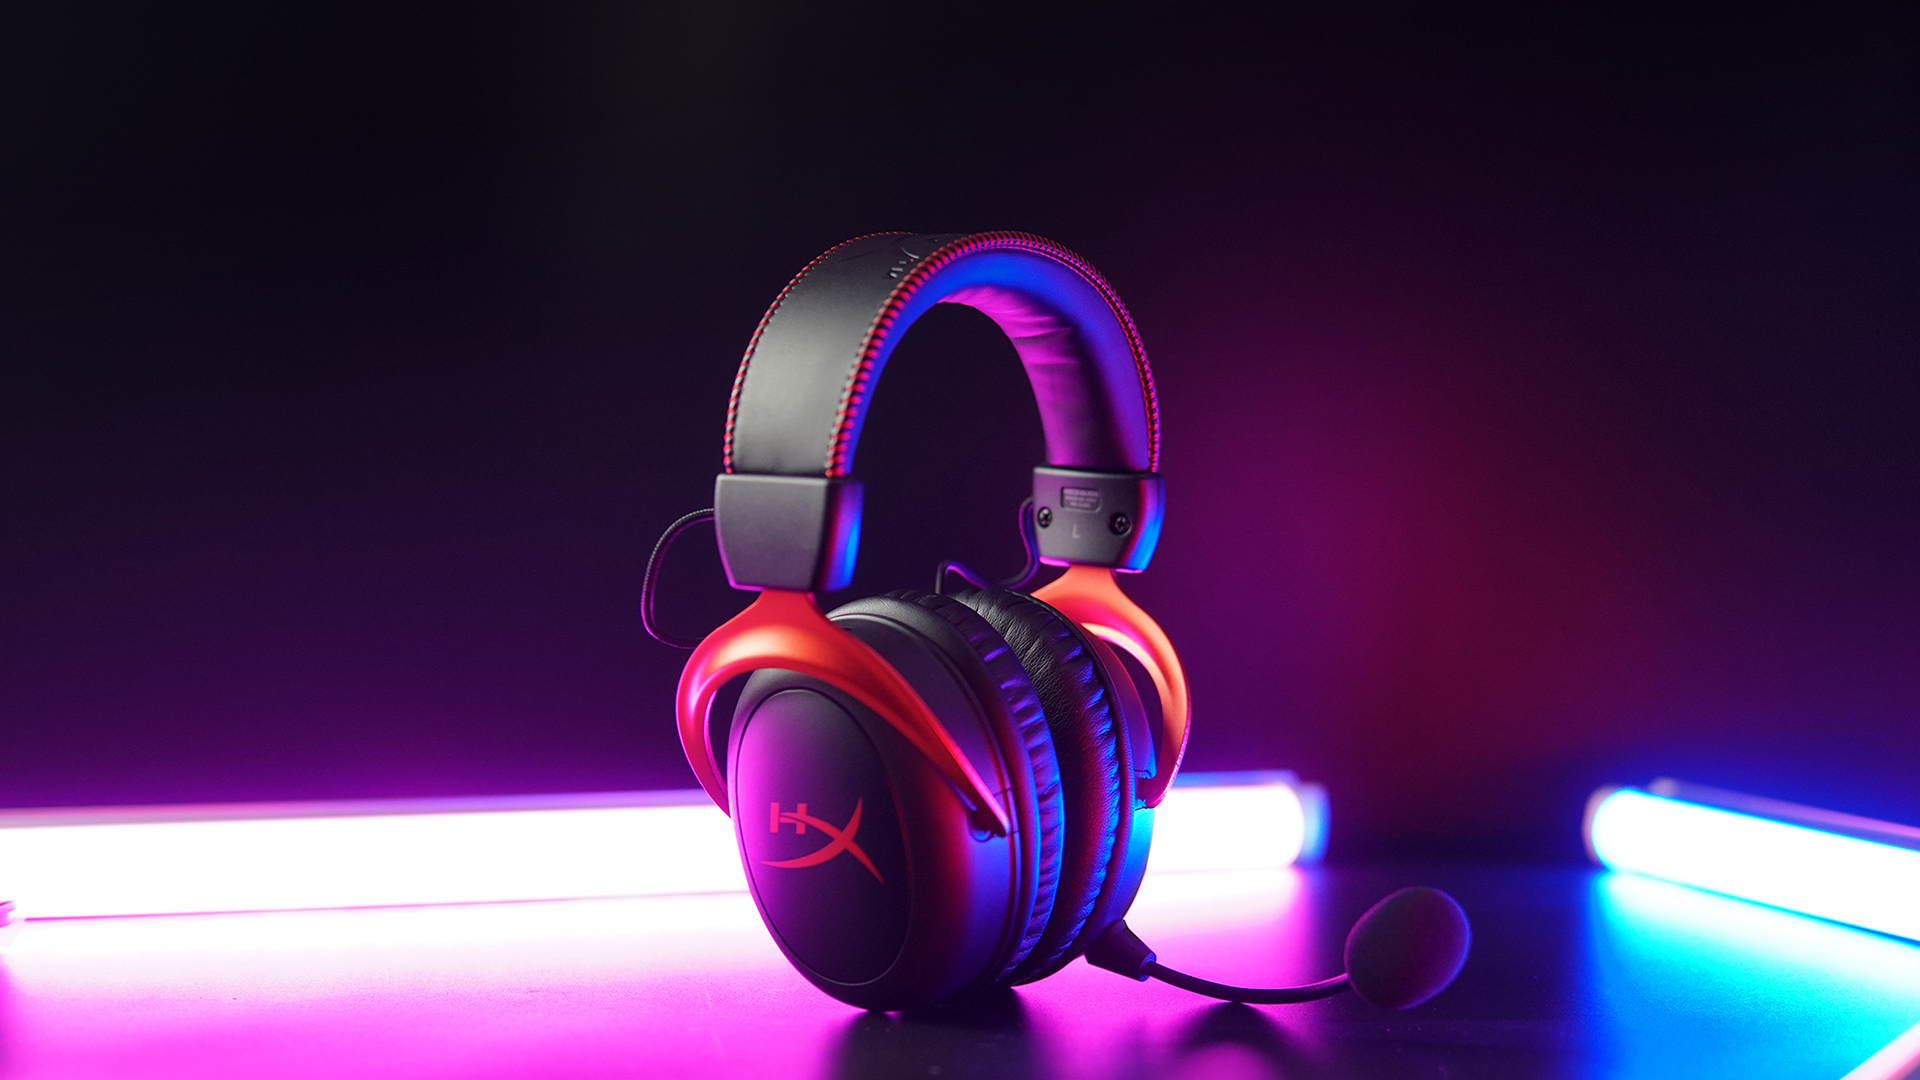 in外设 | 终于等到你!HyperX 飓风无线版游戏耳机体验